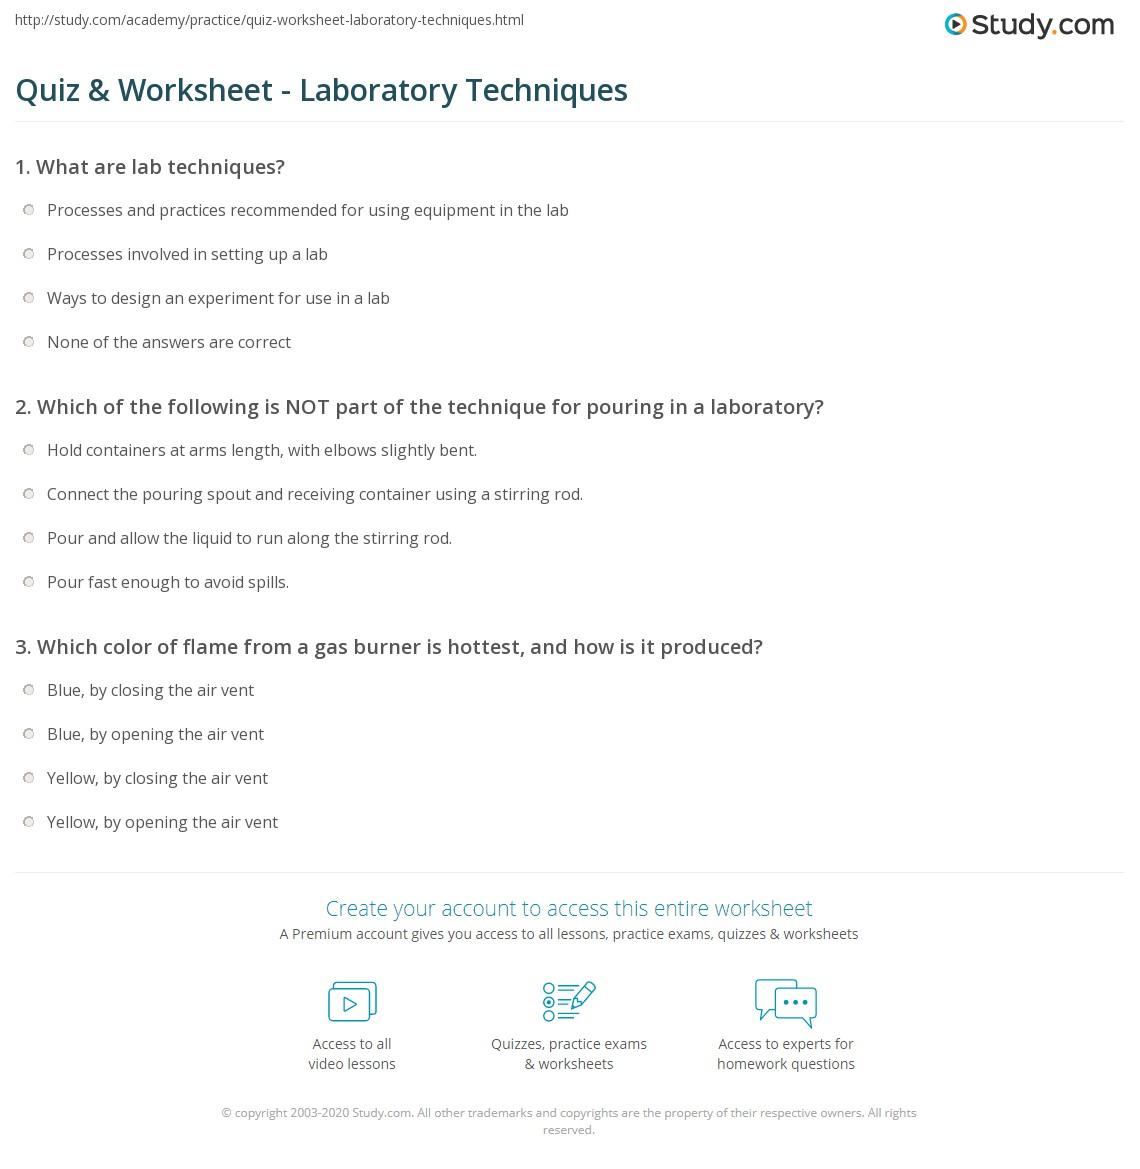 Print Basic Laboratory Techniques Worksheet